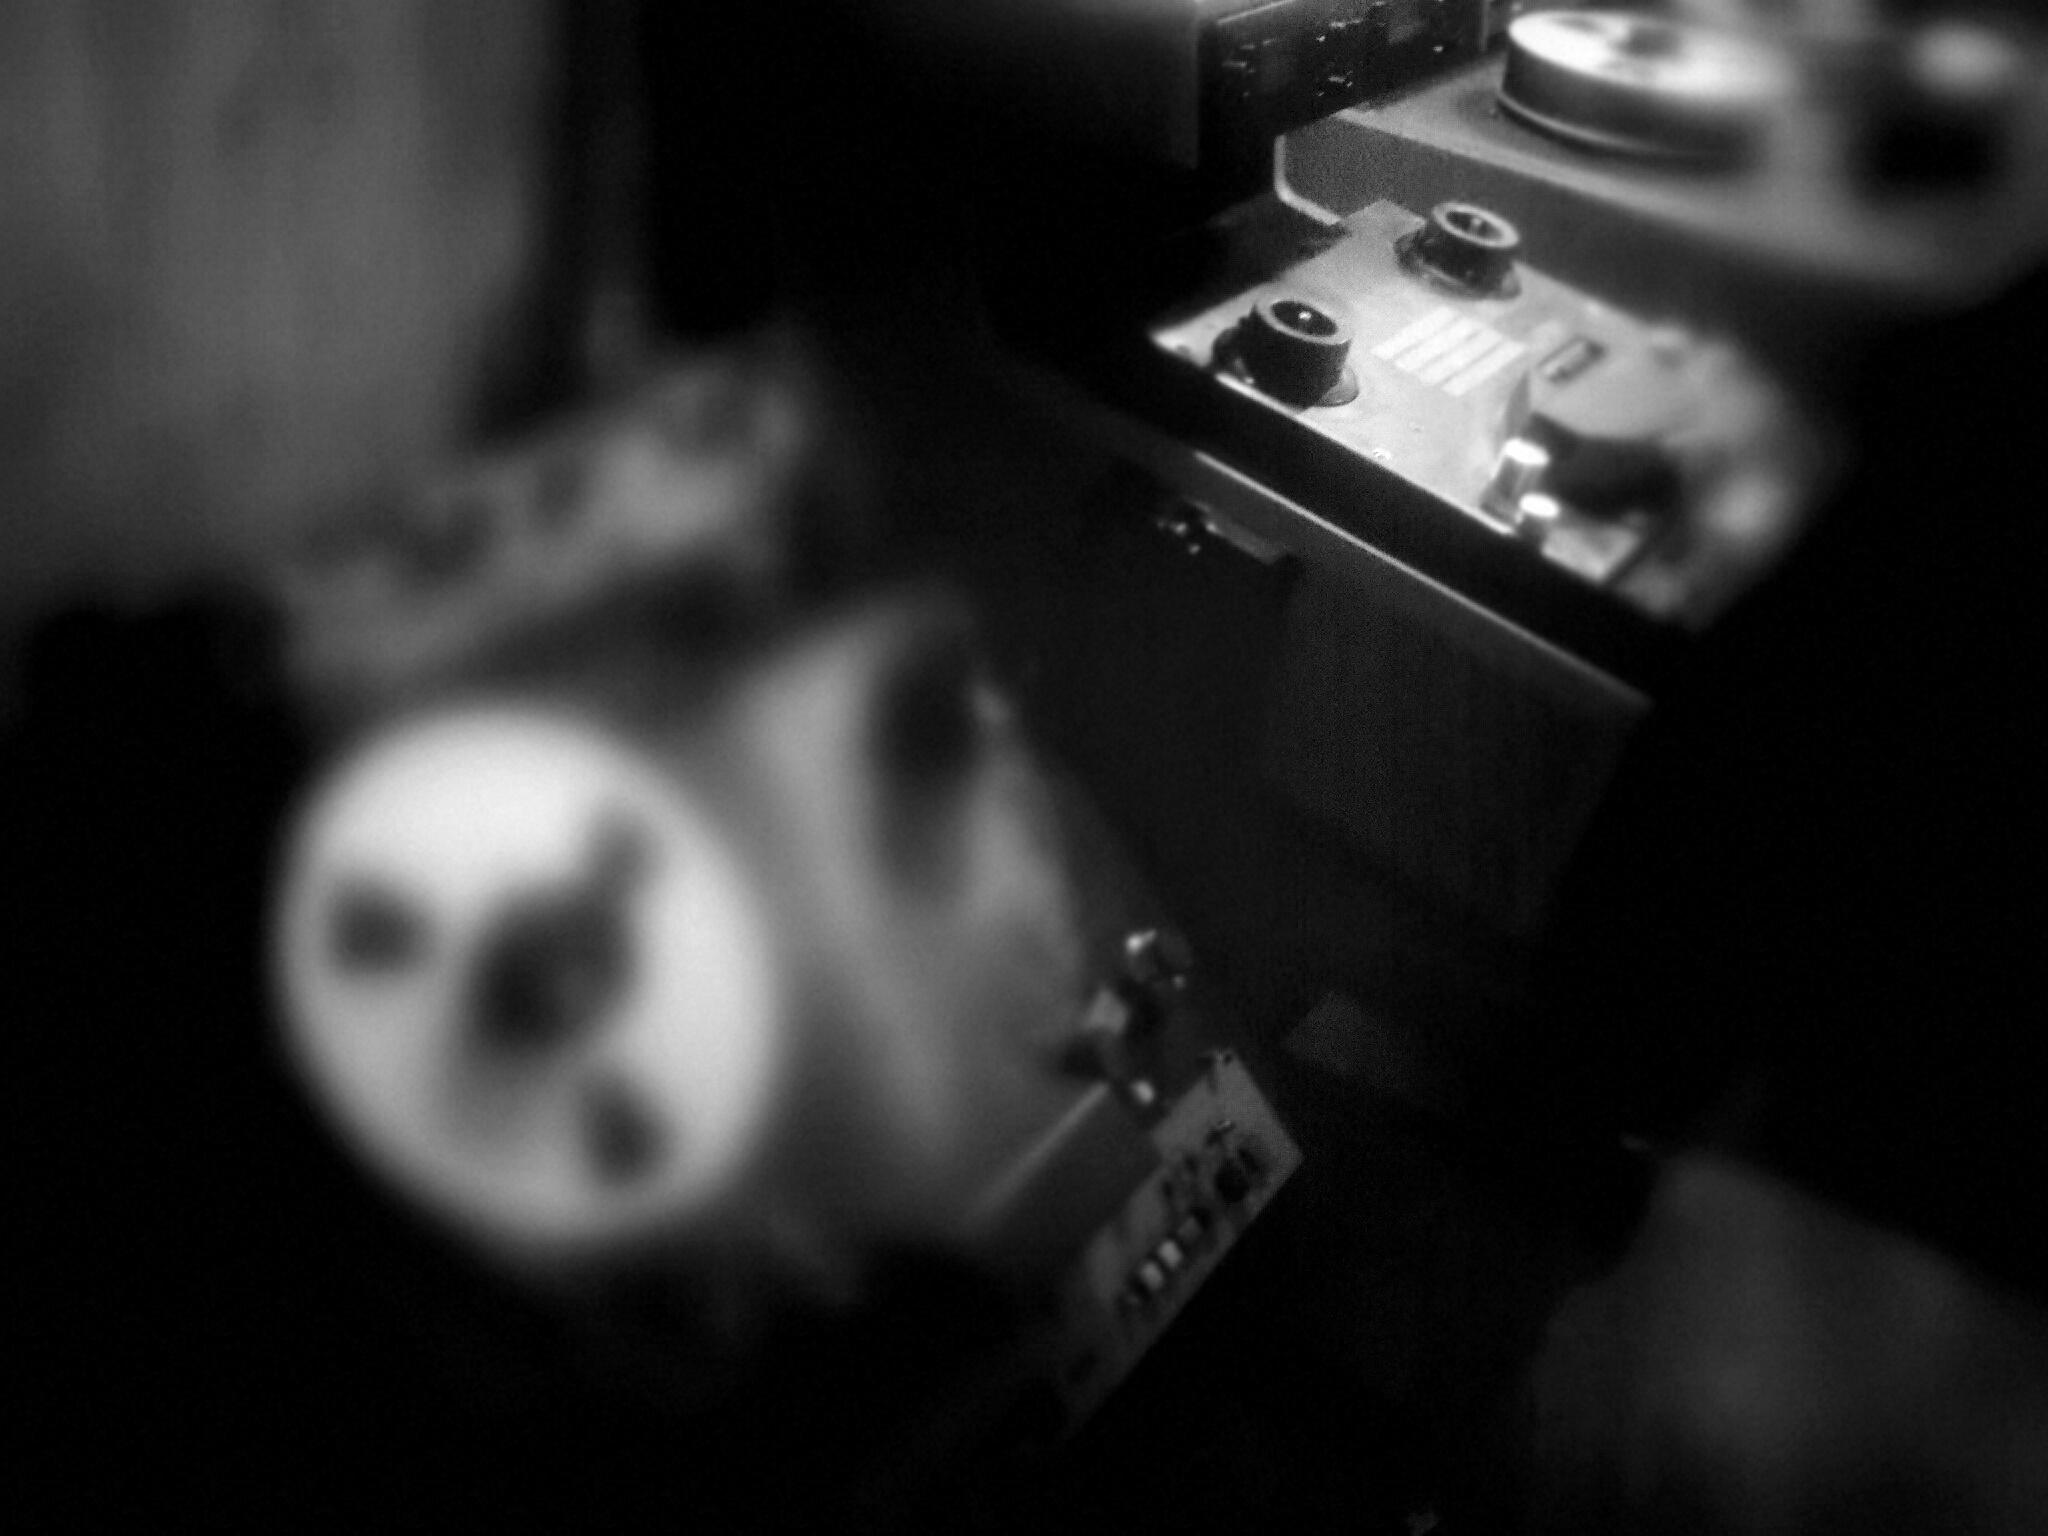 Welcome to 1979 Studio Analog Recording Equipment